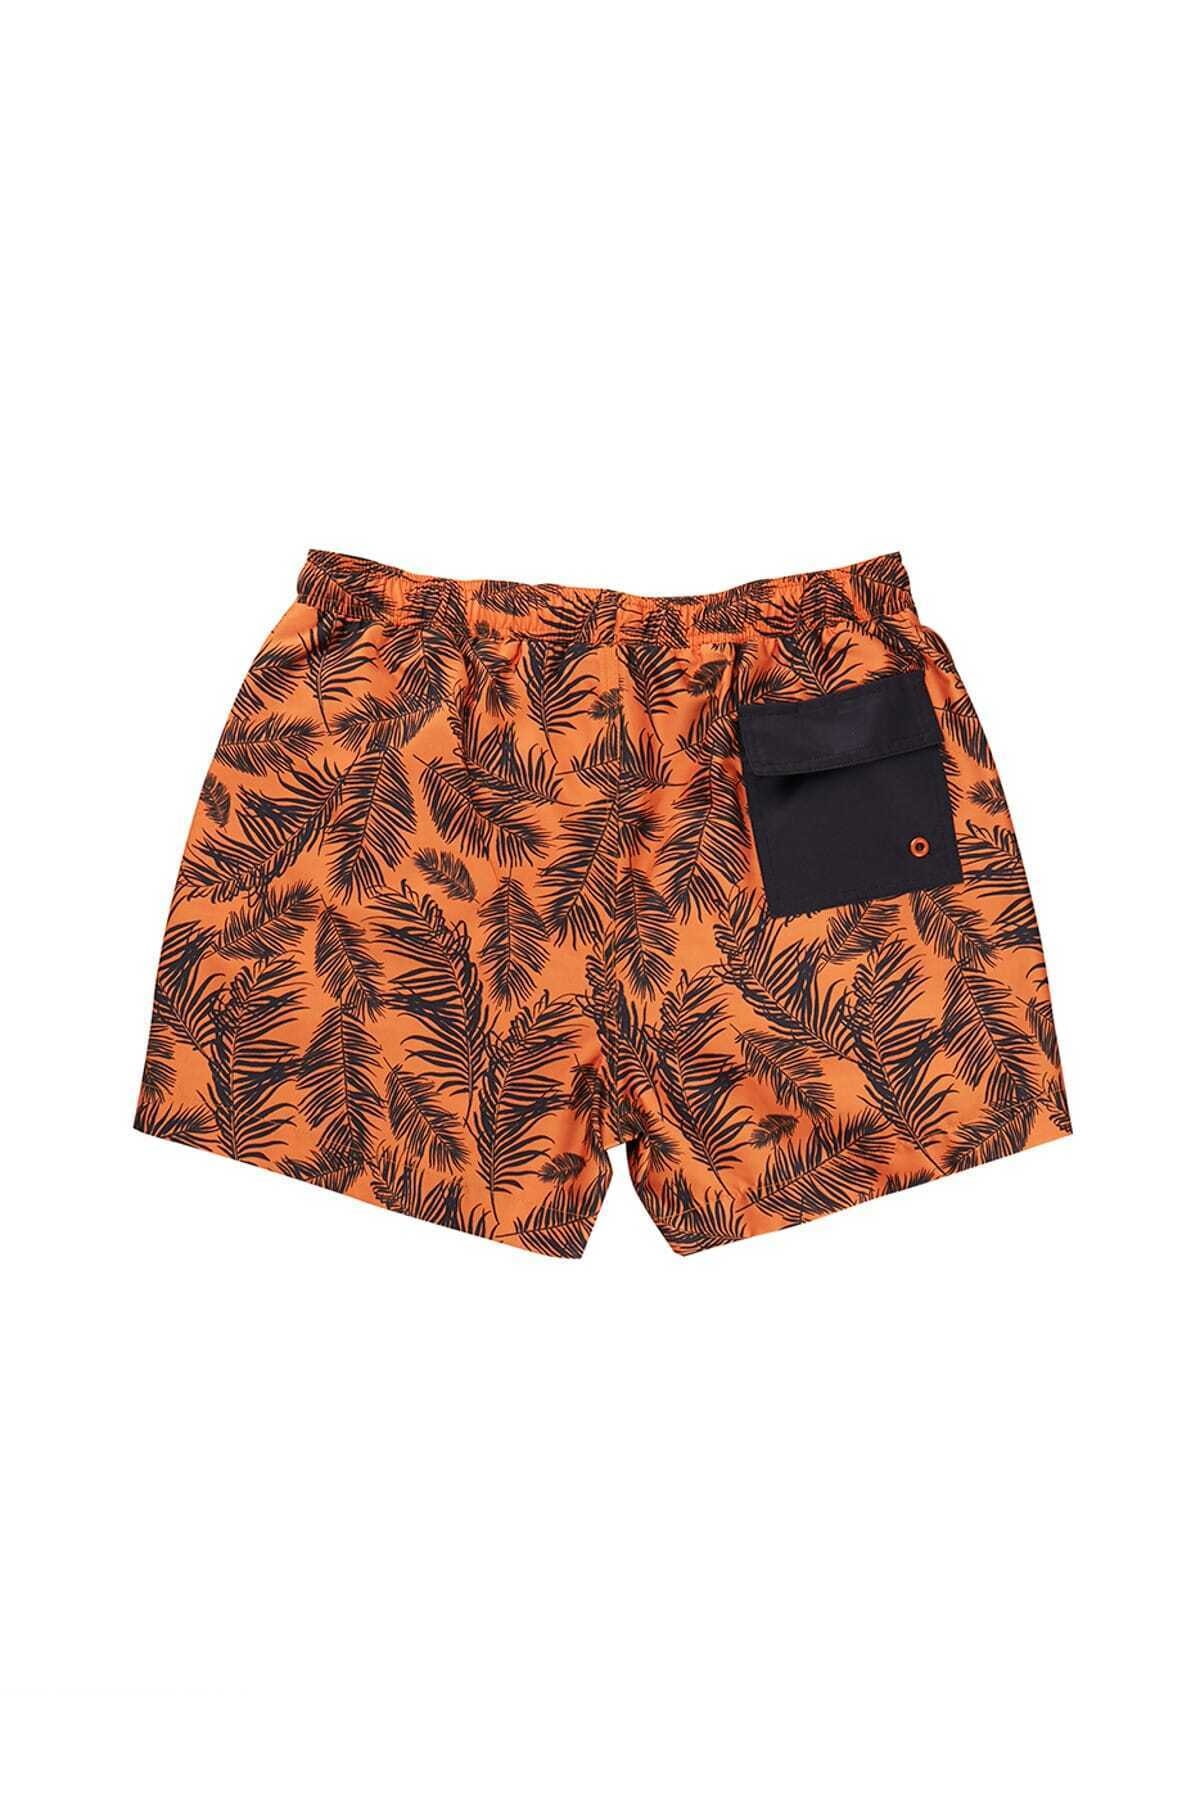 Bad Bear Stream Orange 2